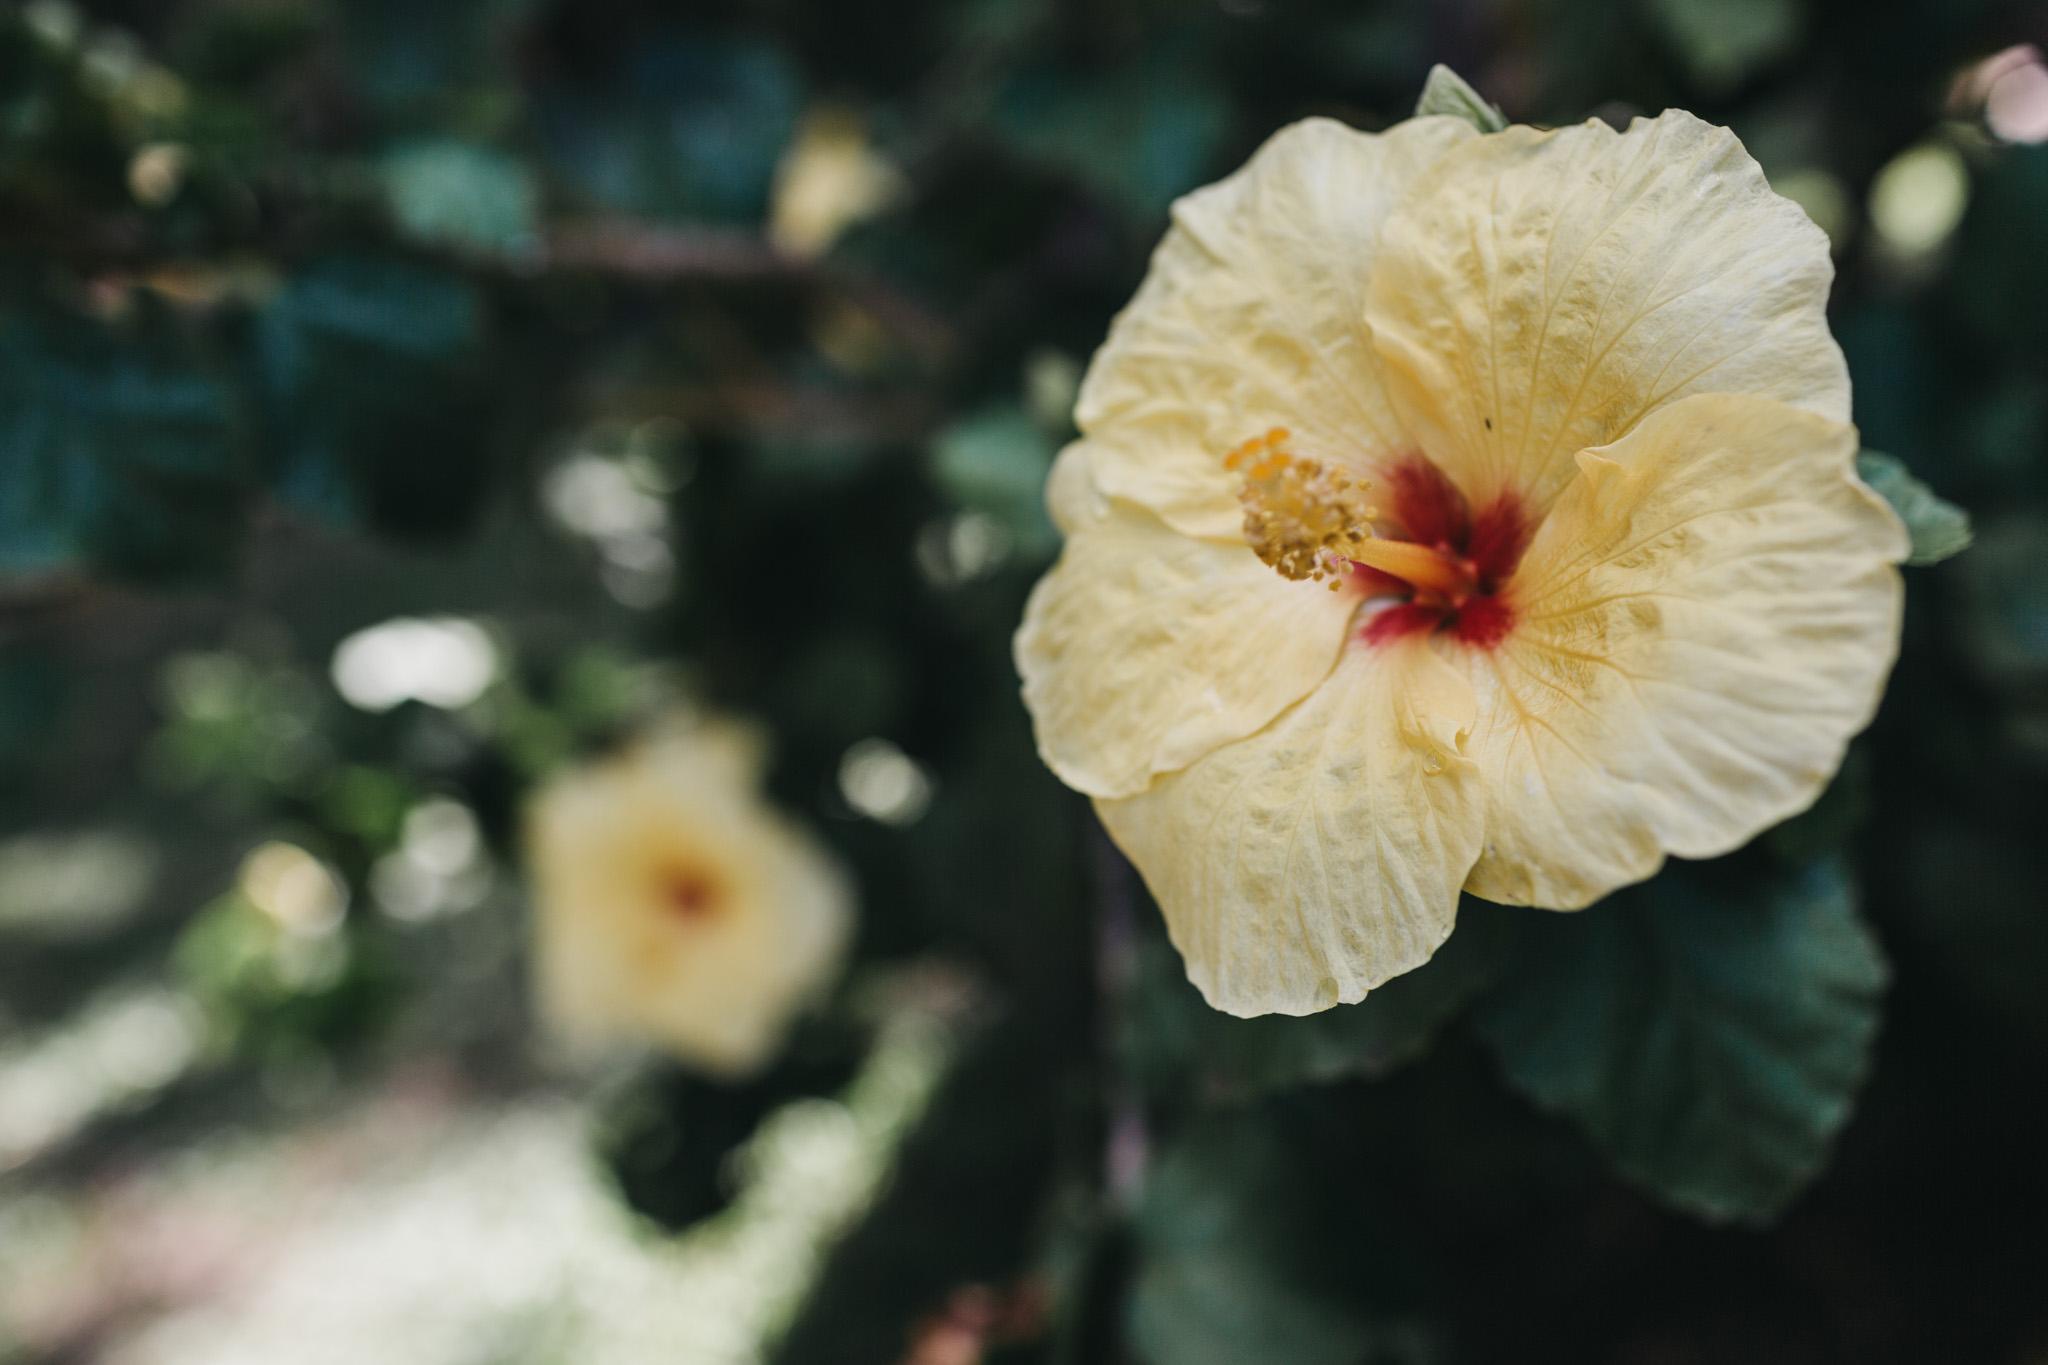 wedding-vow-renewal-hawaii-hochzeit-maui-silberhochzeit-karol-and-jens_100.jpg